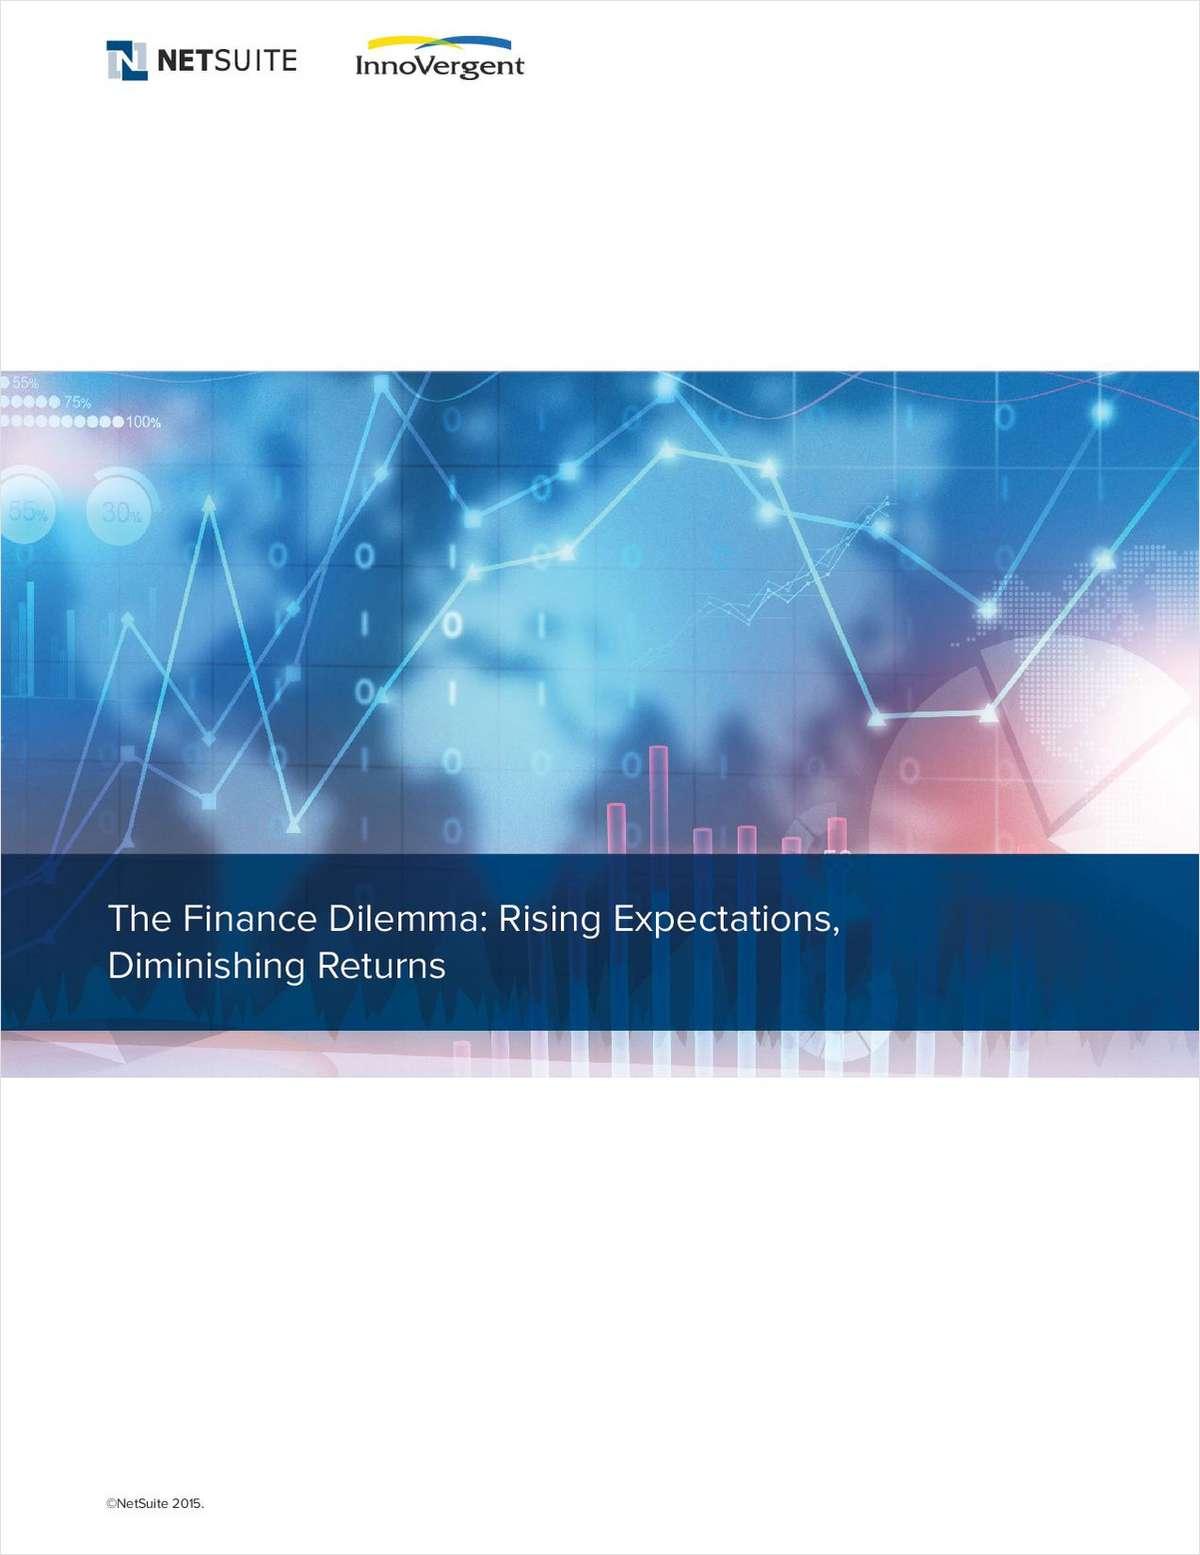 The Finance Dilemma: Rising Expectations, Diminishing Returns